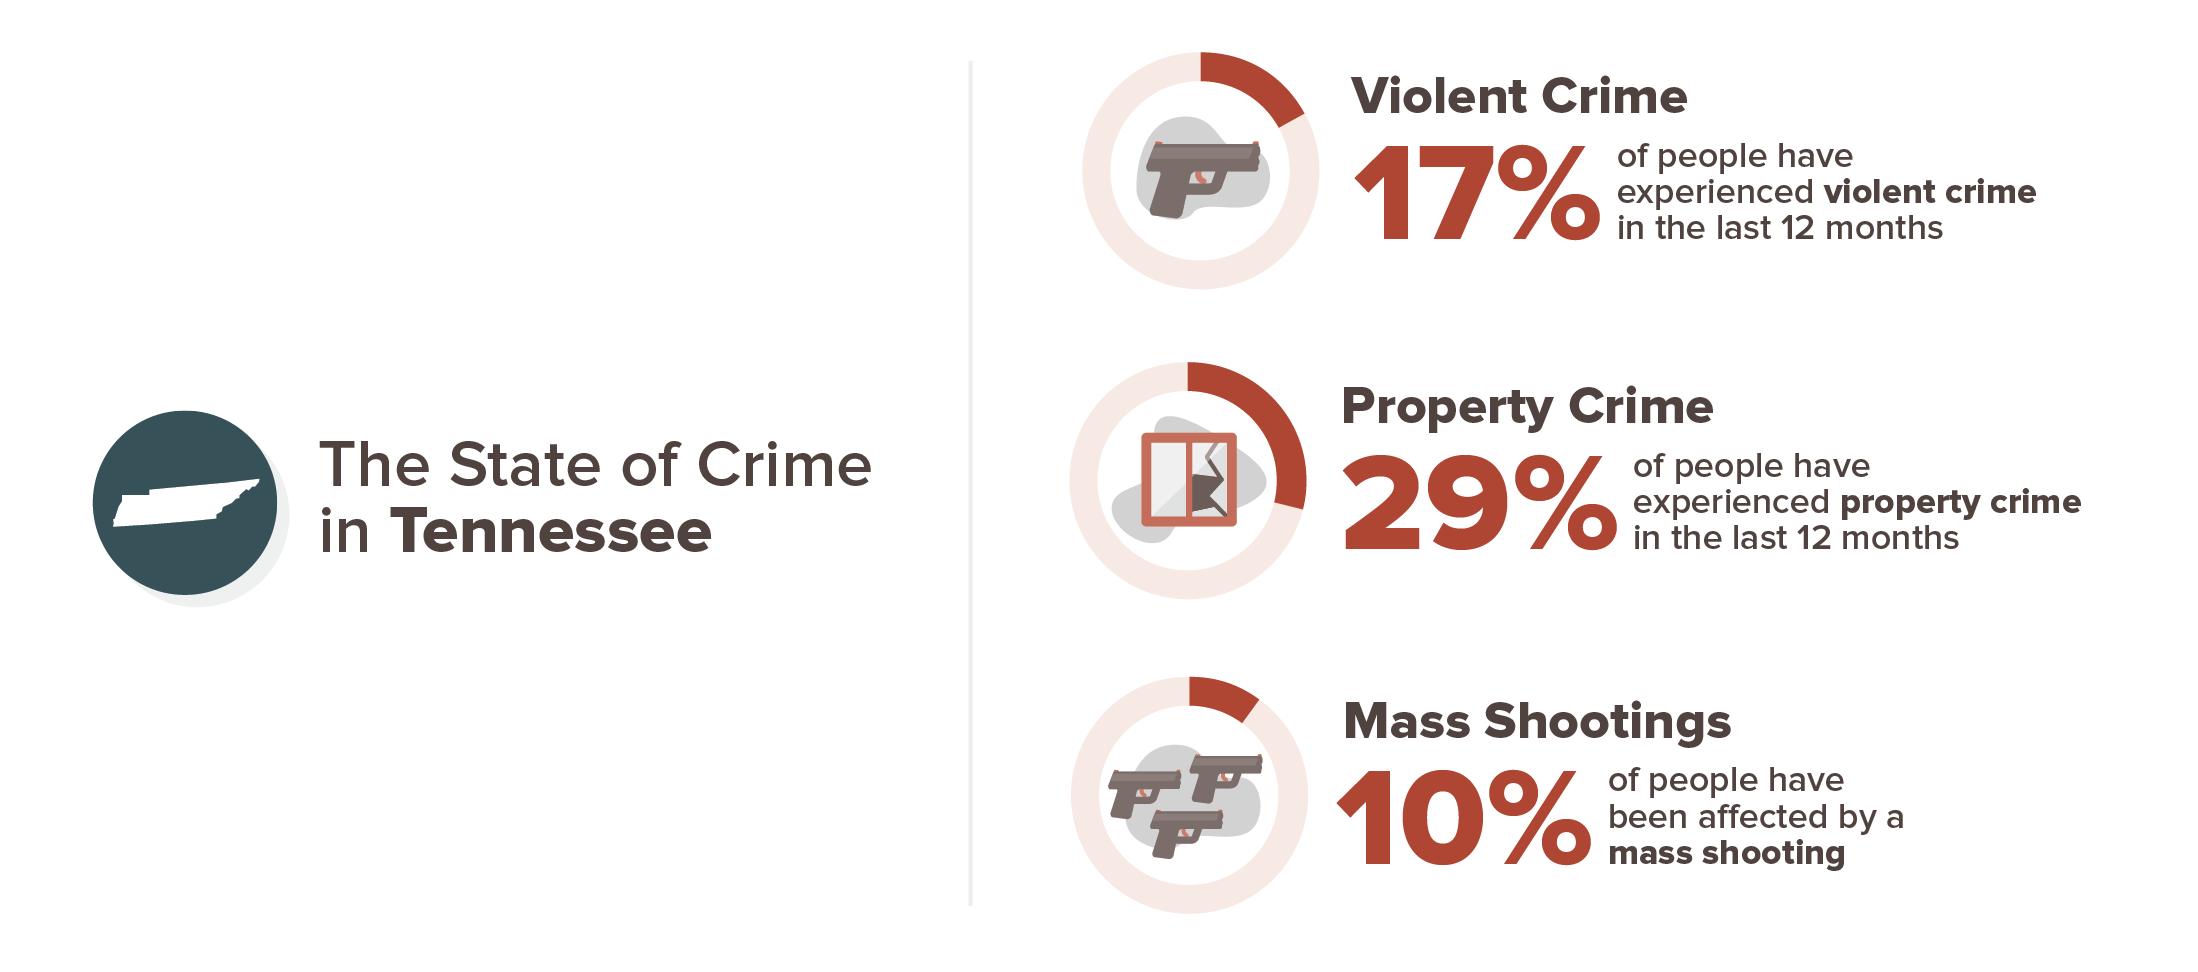 17 percent have experienced violent crime, 29 percent have experienced property crime, 10 percent have experienced a mass shooting